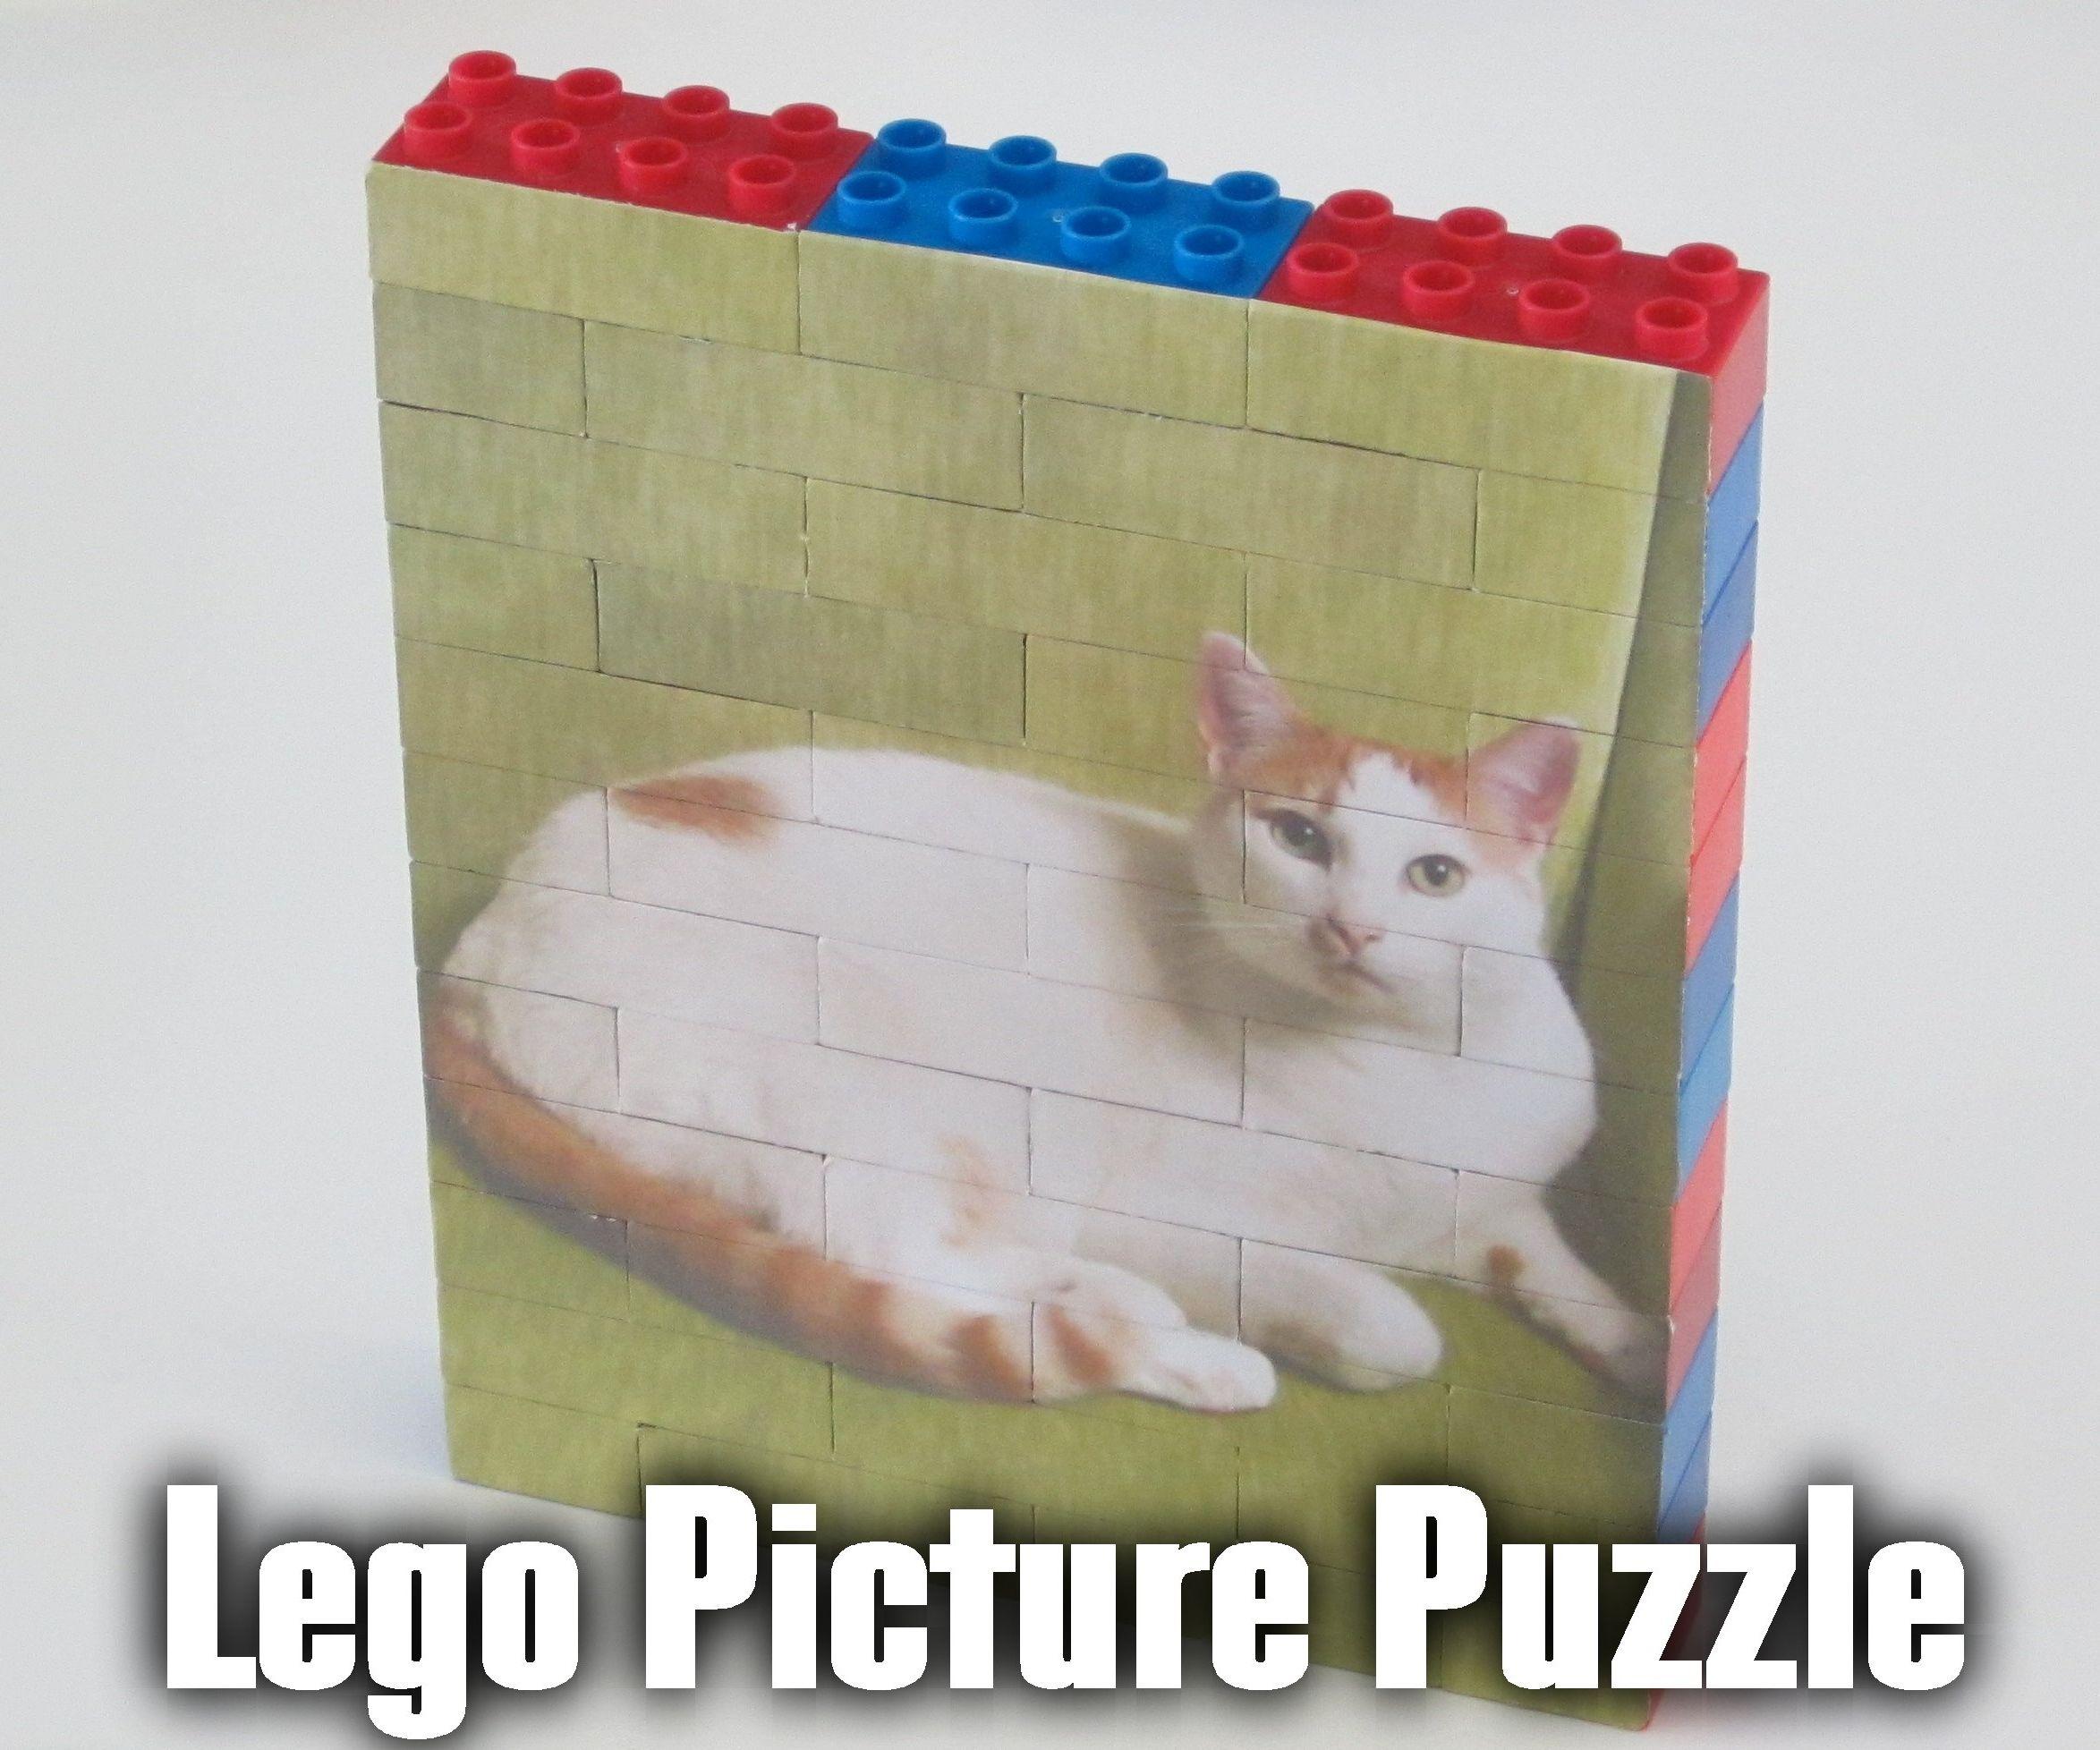 Building Block Picture Puzzle